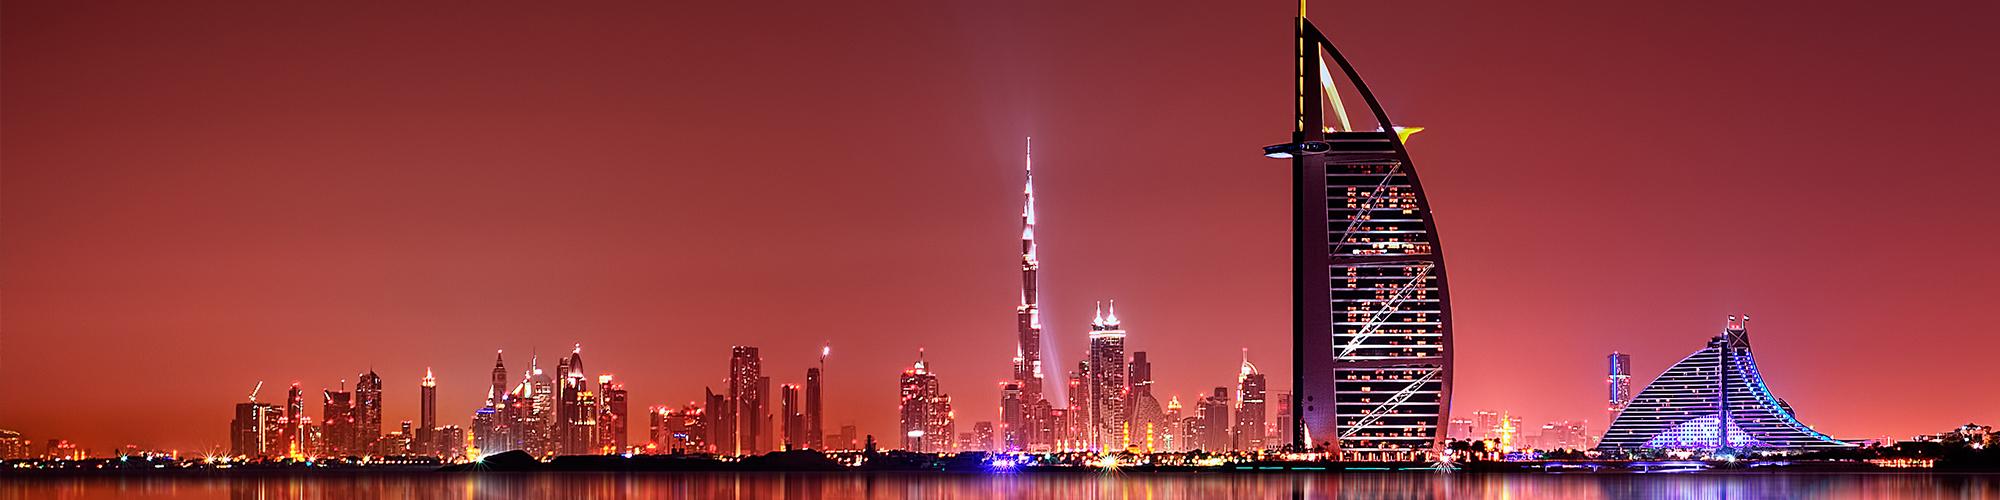 Glamour en el desierto: Abu Dhabi, Dubai, Sharjah y Fujairah - El País Viajes